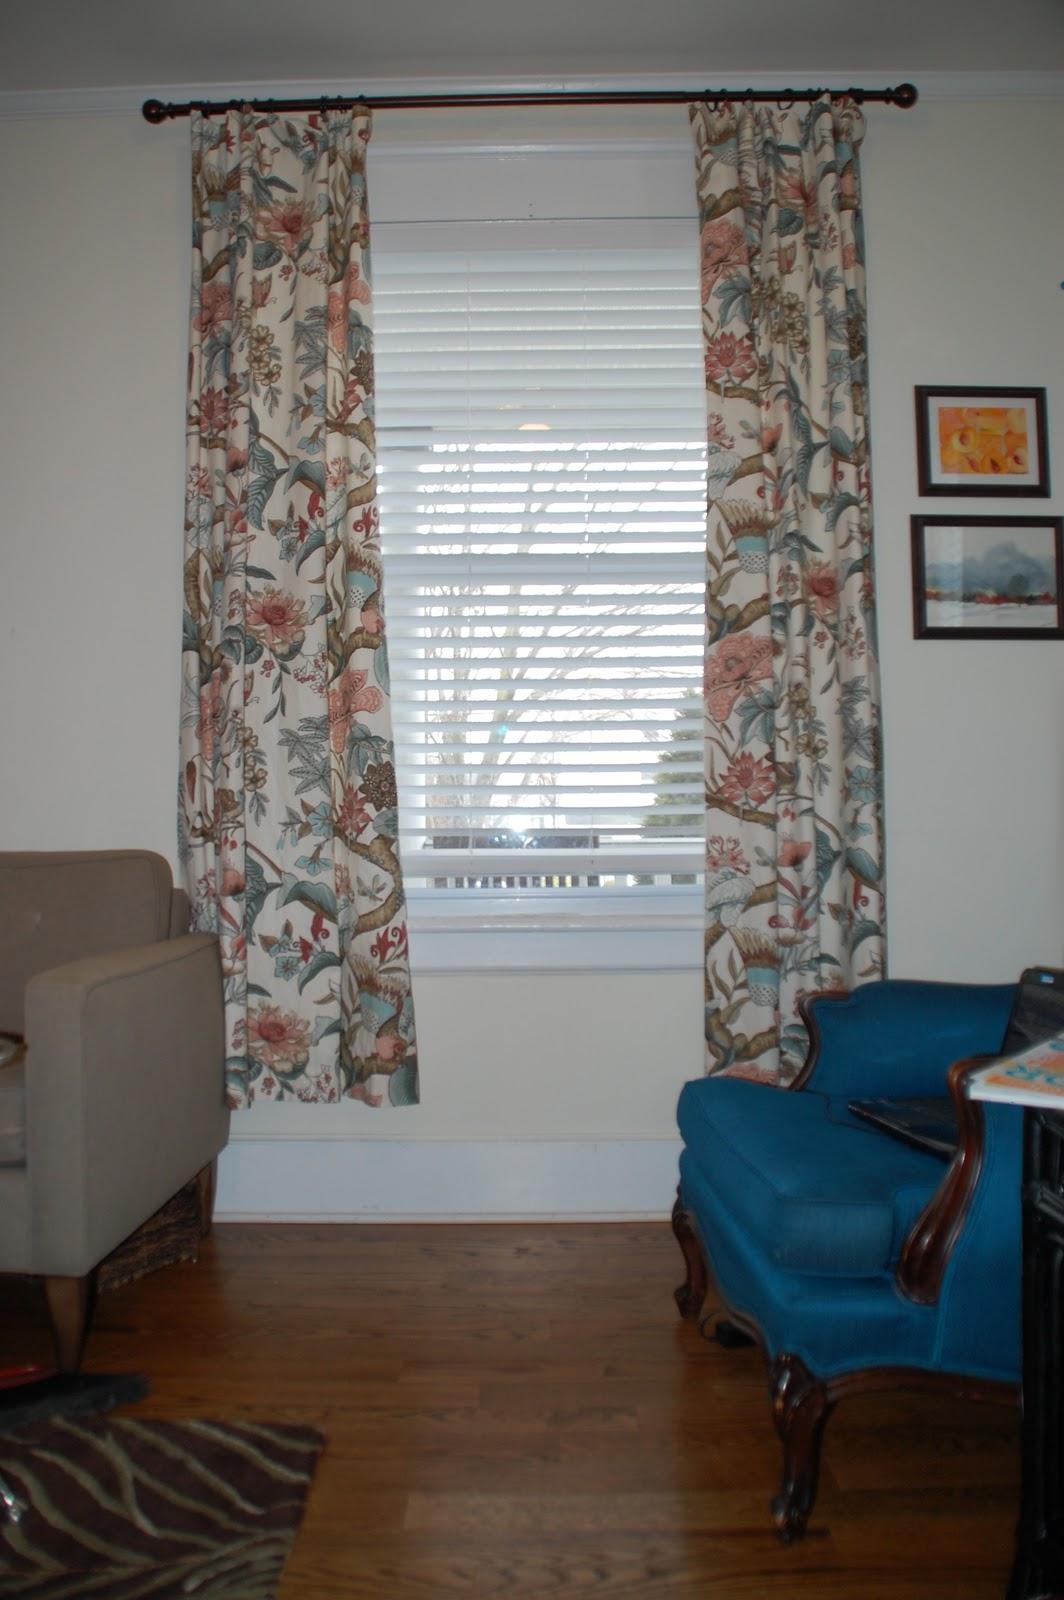 #DesignDilemma: How Do I Hang My Curtains?